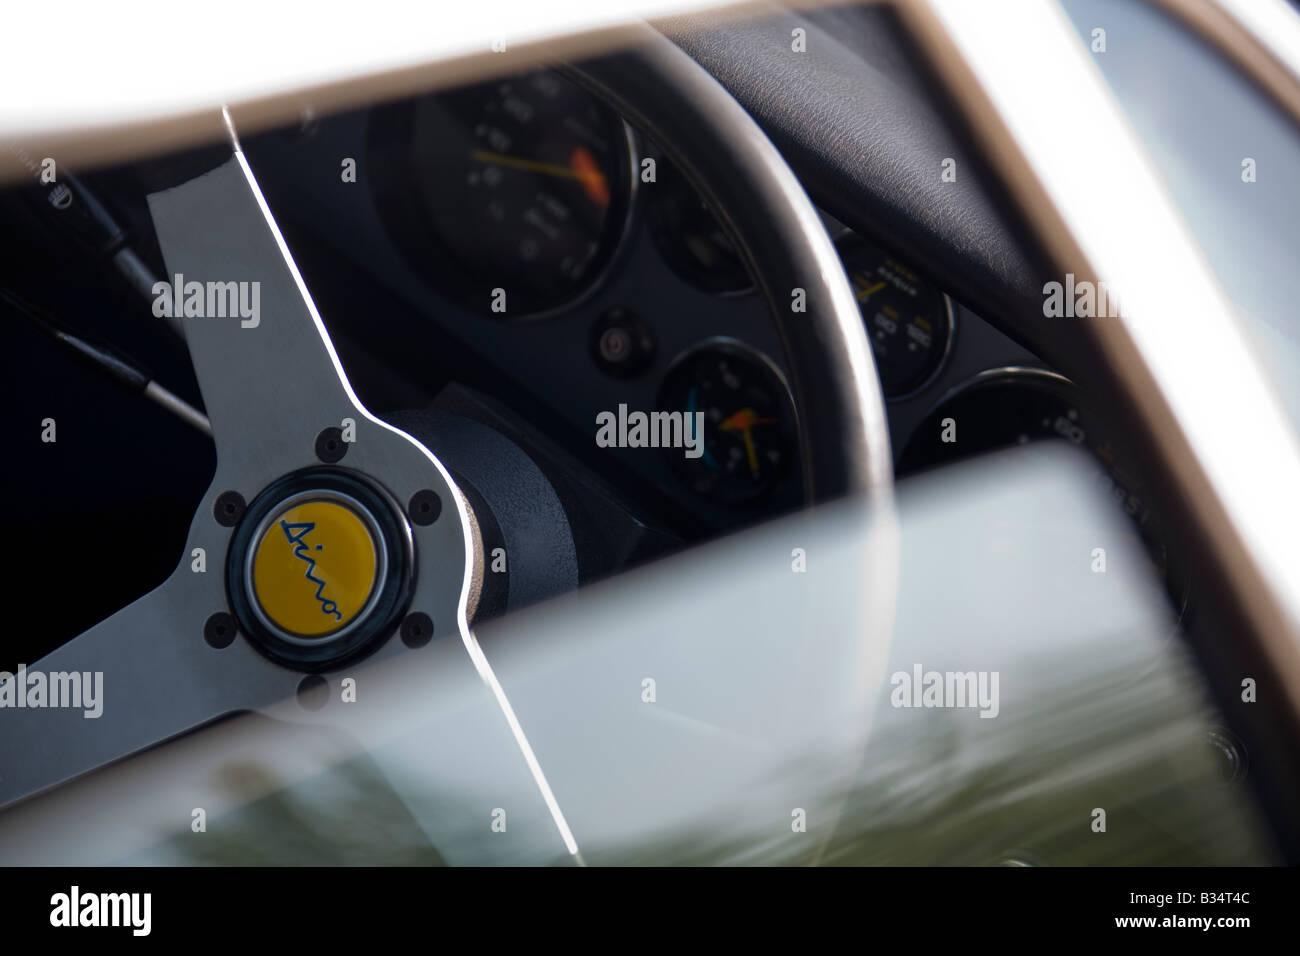 Ferrari Dino steering wheel through window - Stock Image